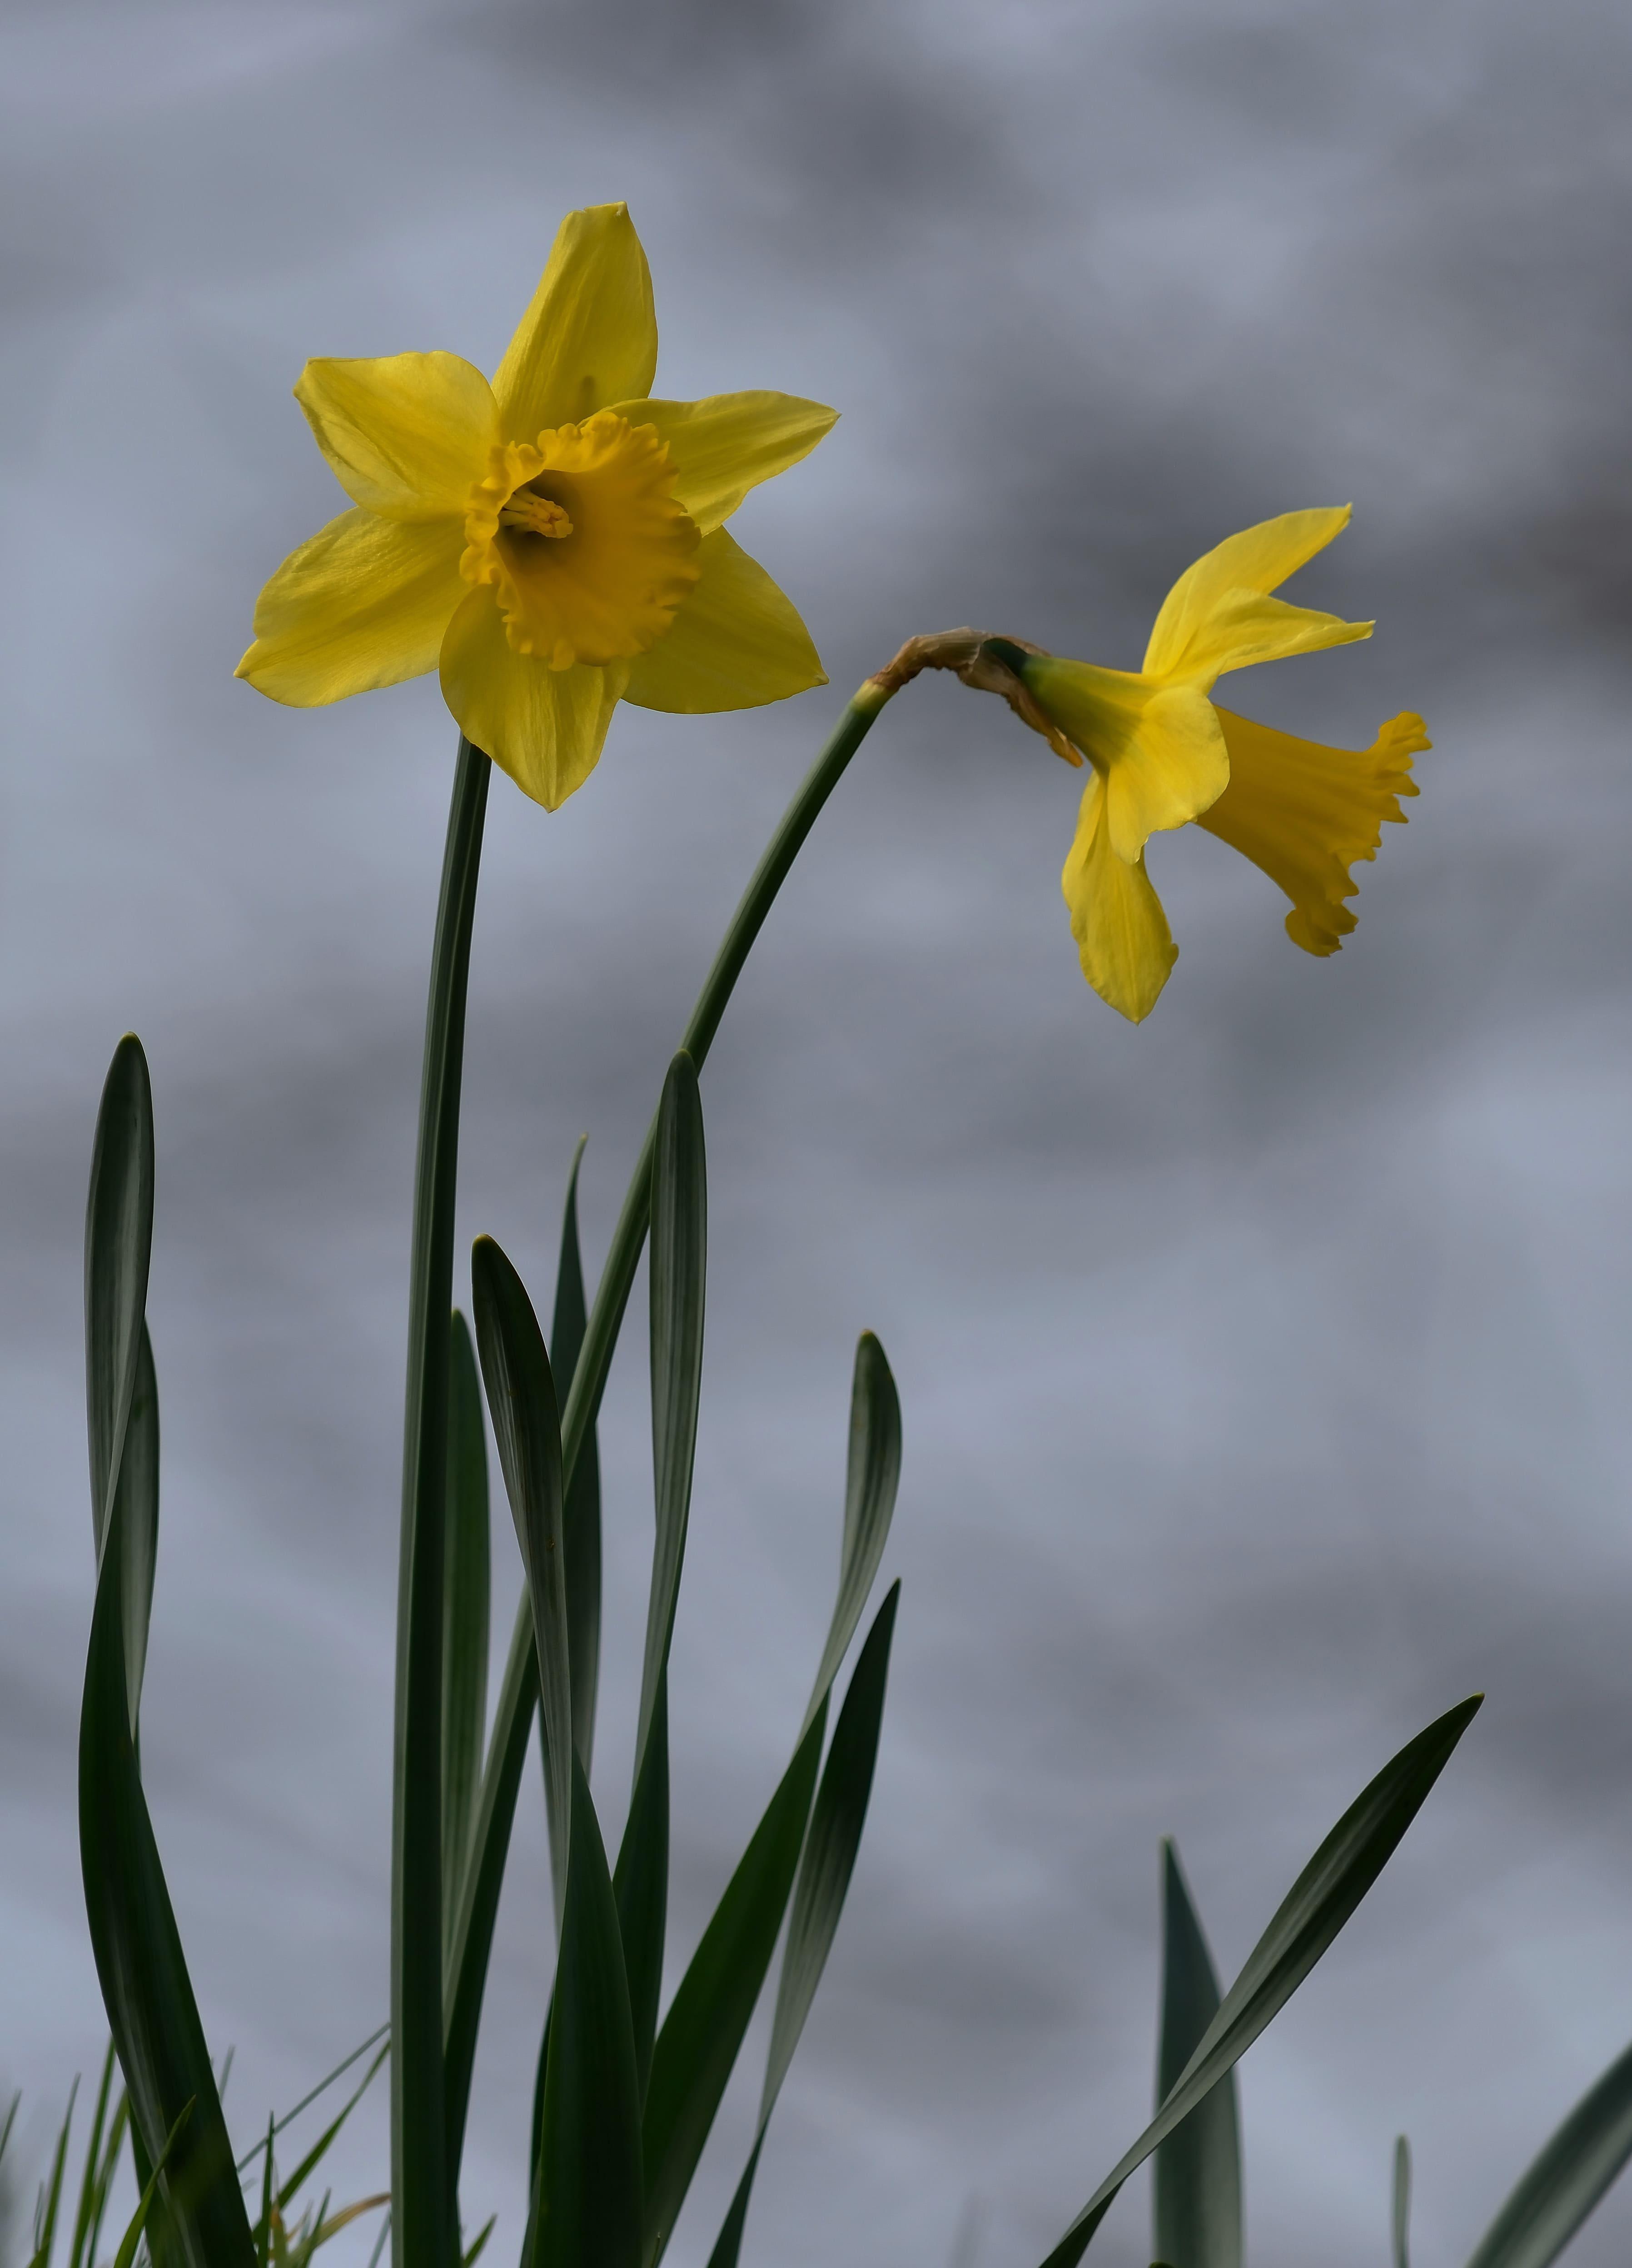 daffodils-photo-10